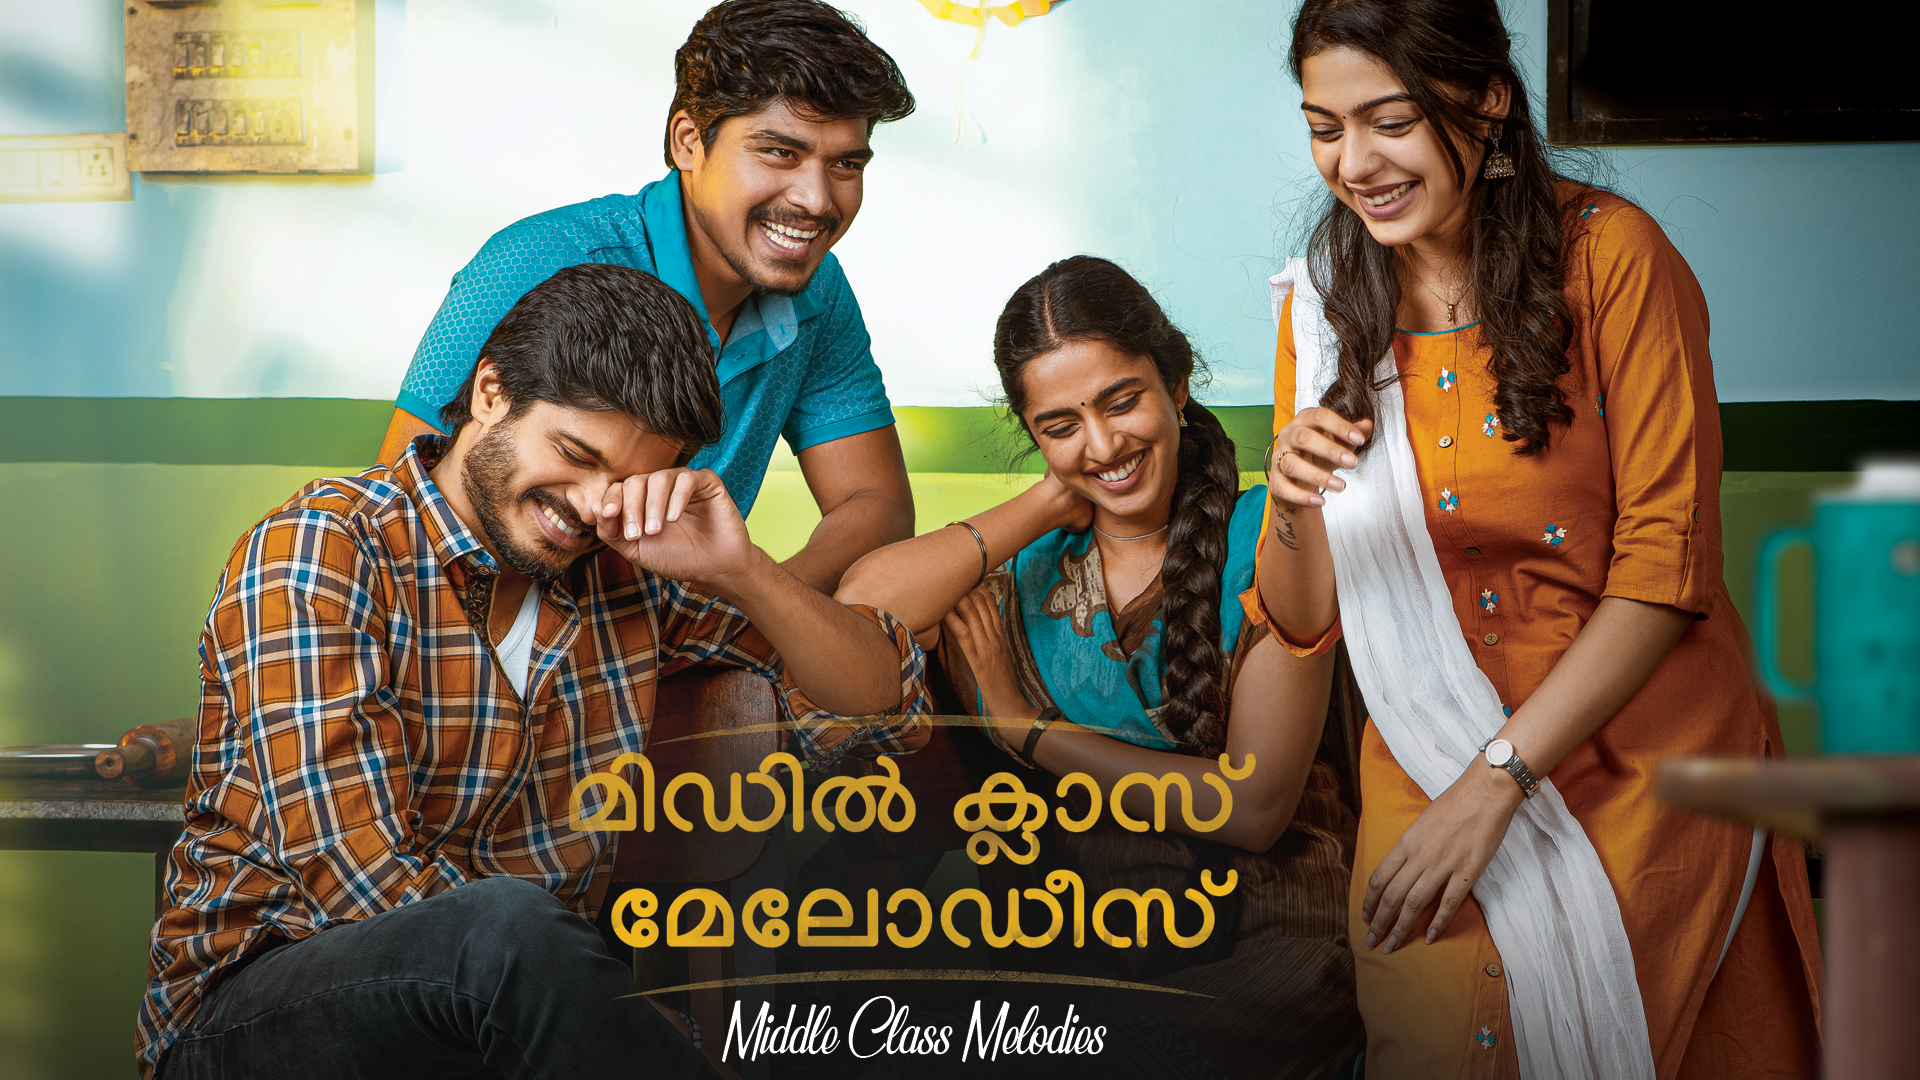 Middle Class Melodies (Malayalam)